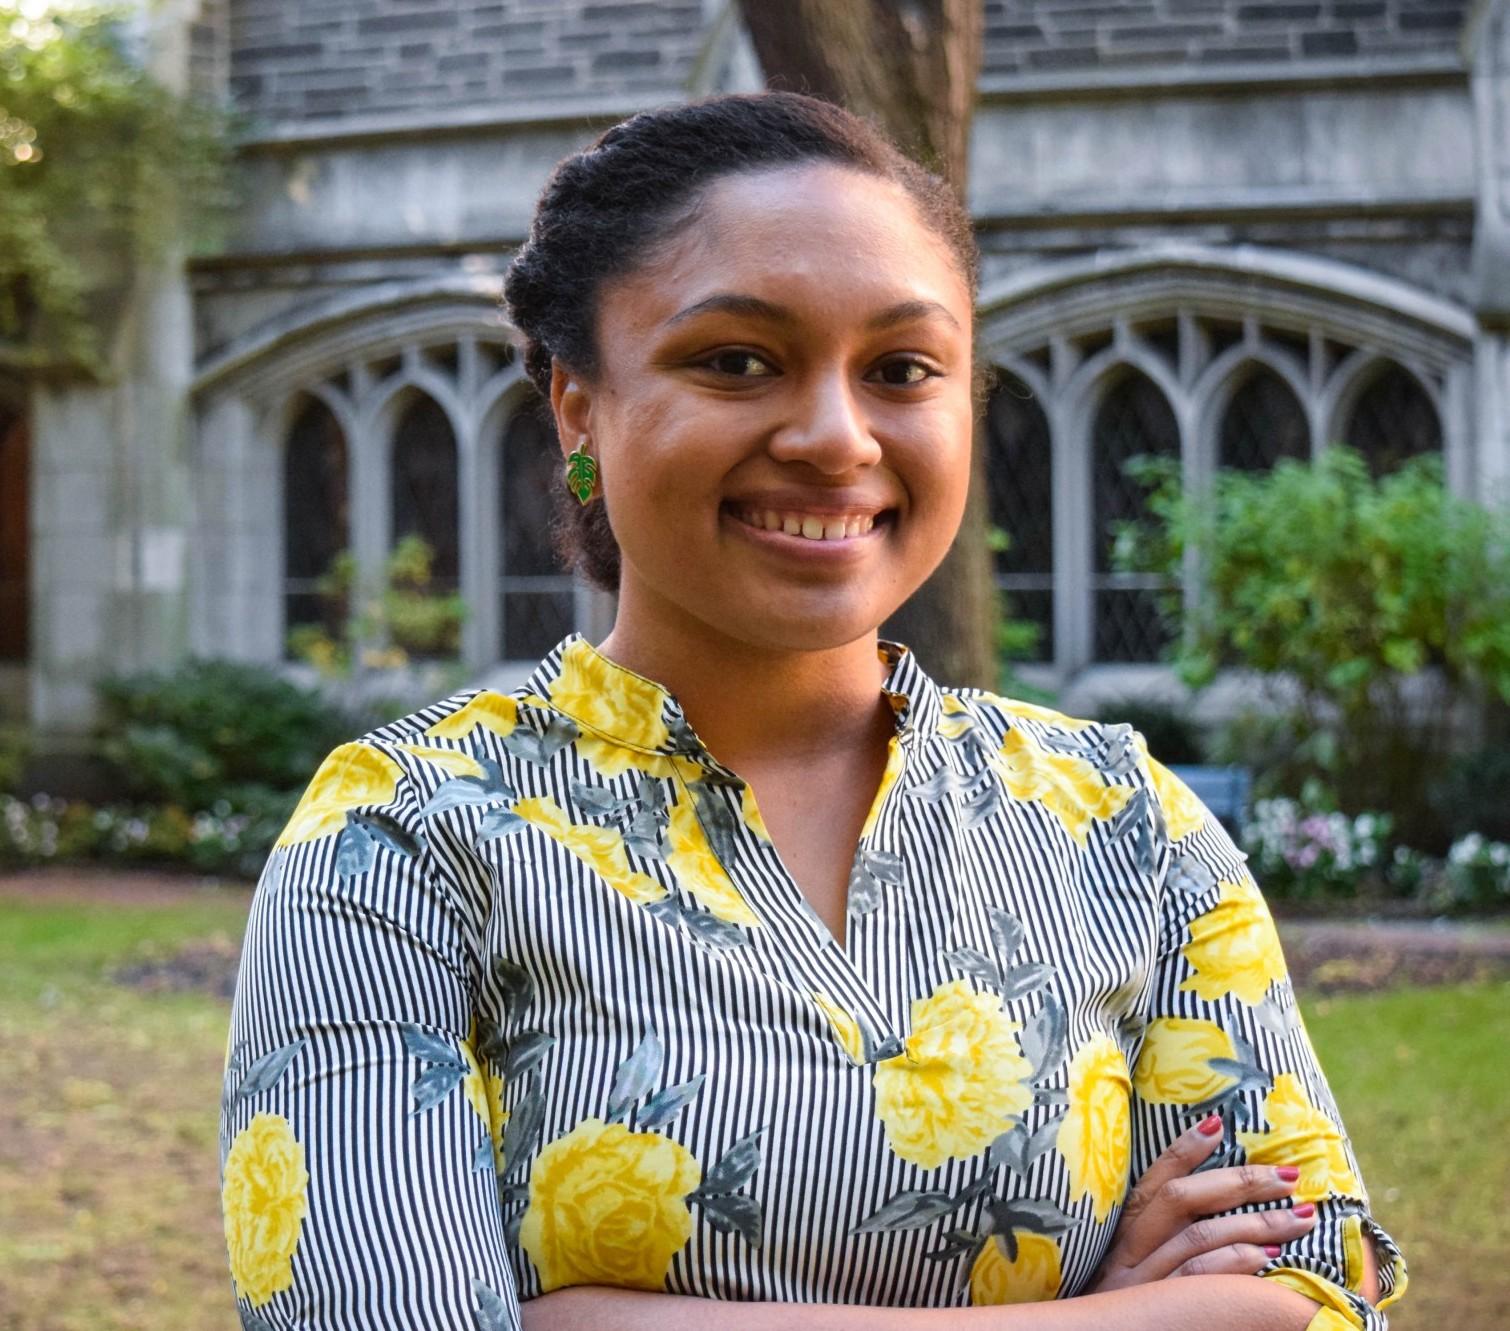 photo of LeShae Henderson